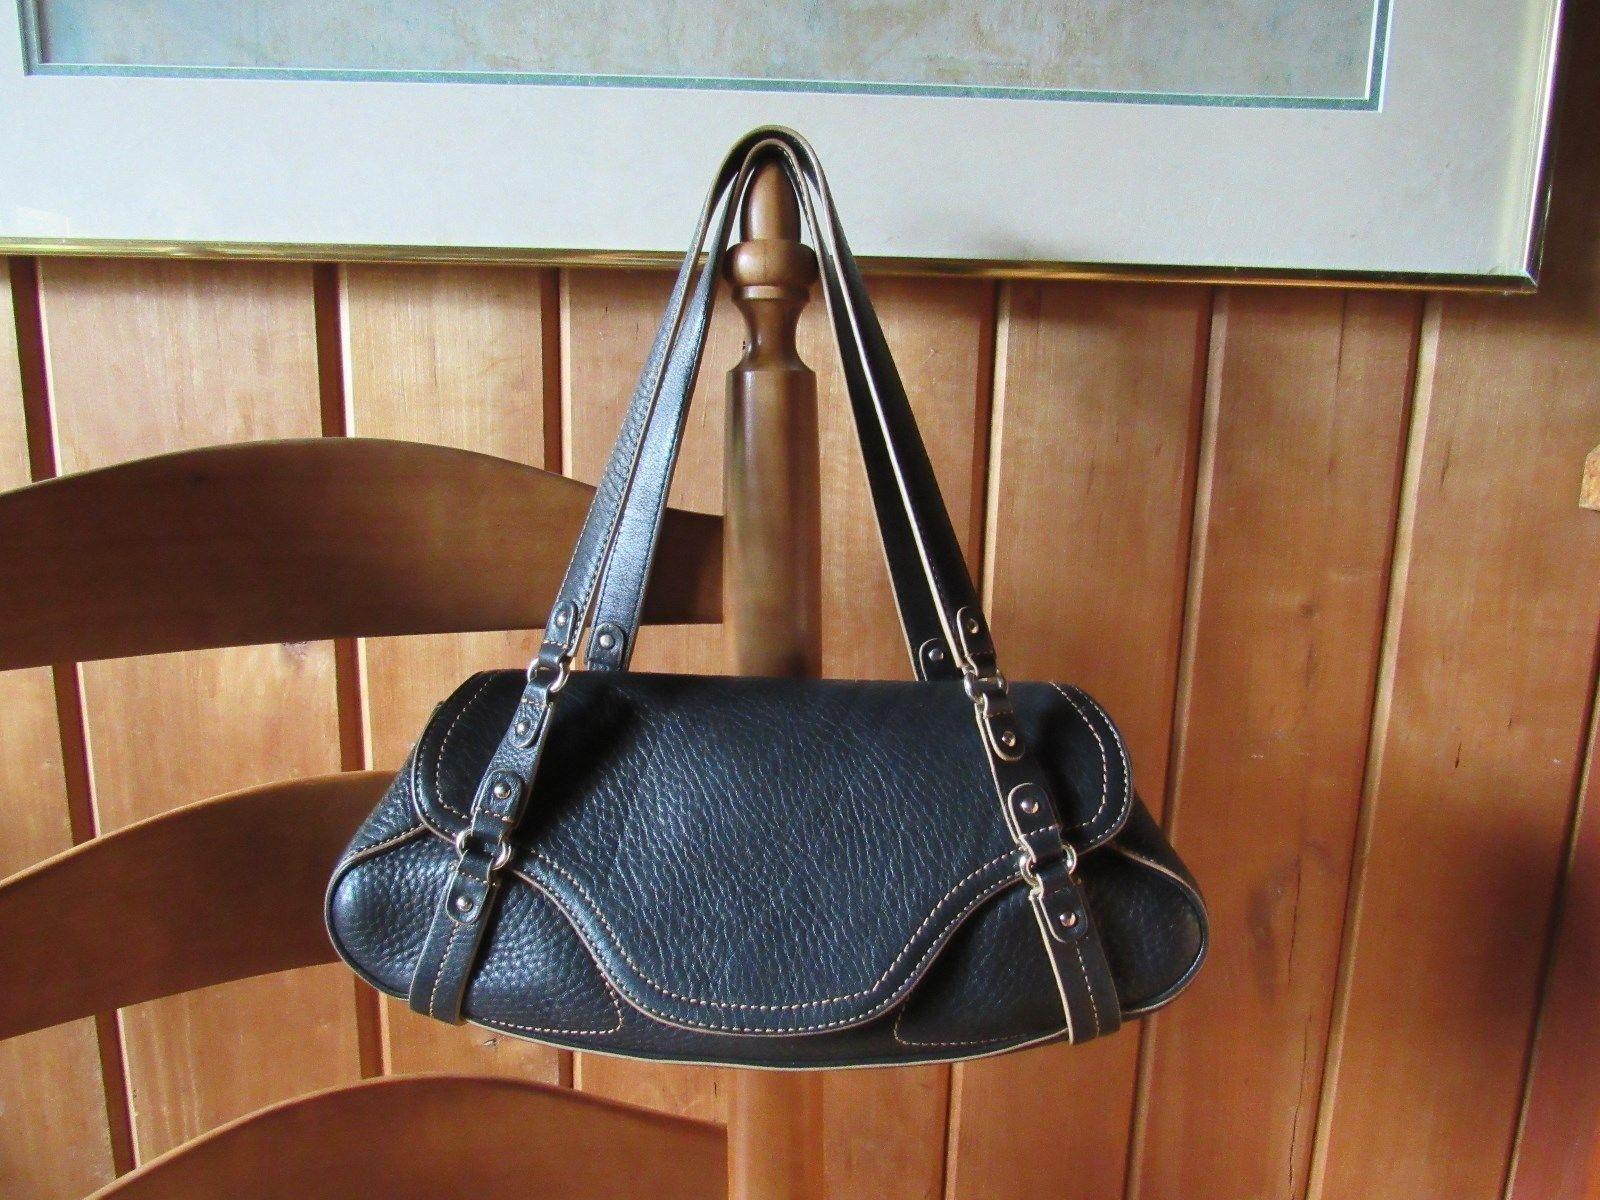 Cole Haan Handbag Dark Plush Leather Baguette F05 Purse Straps Chrome Fittings